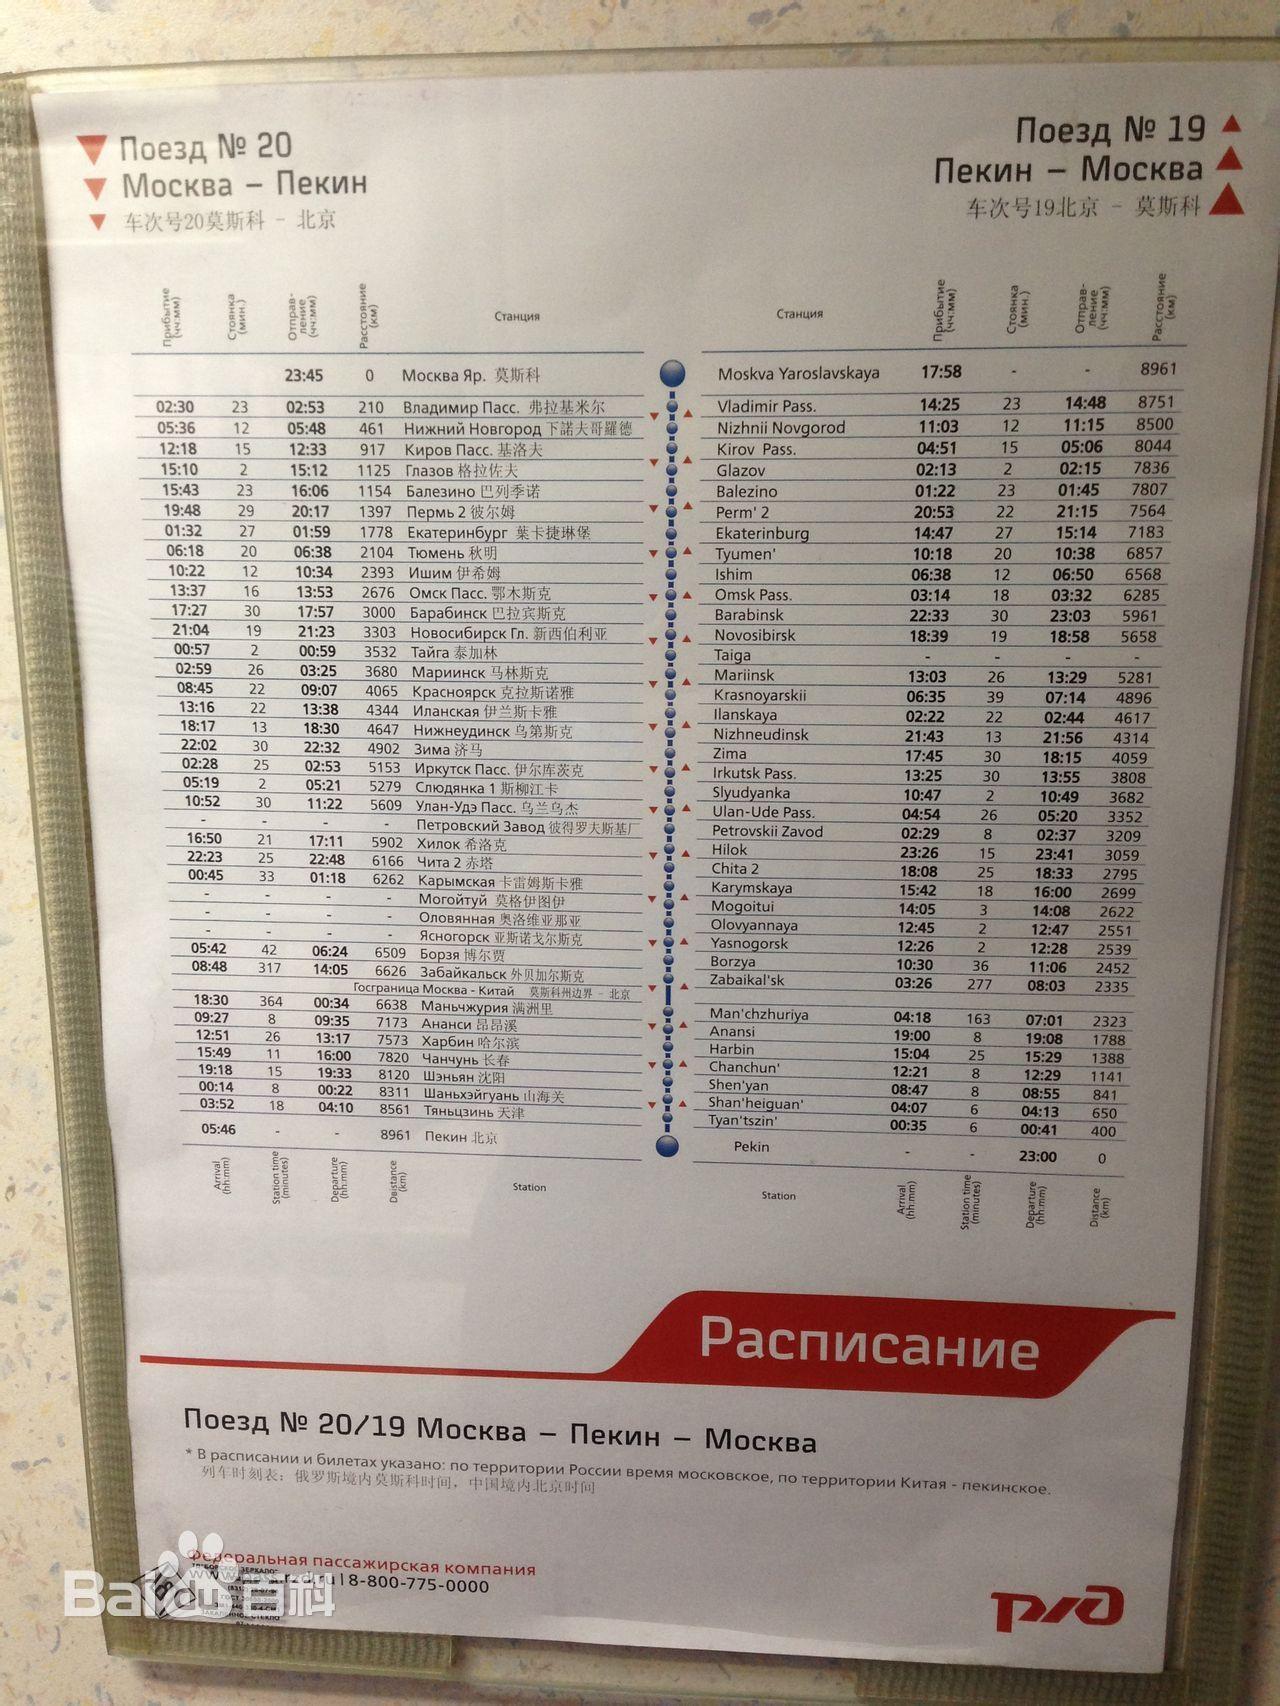 k527次列车时刻表_求k19次列车和k3次列车的详细列车时刻表,主要是俄罗斯境内的 ...